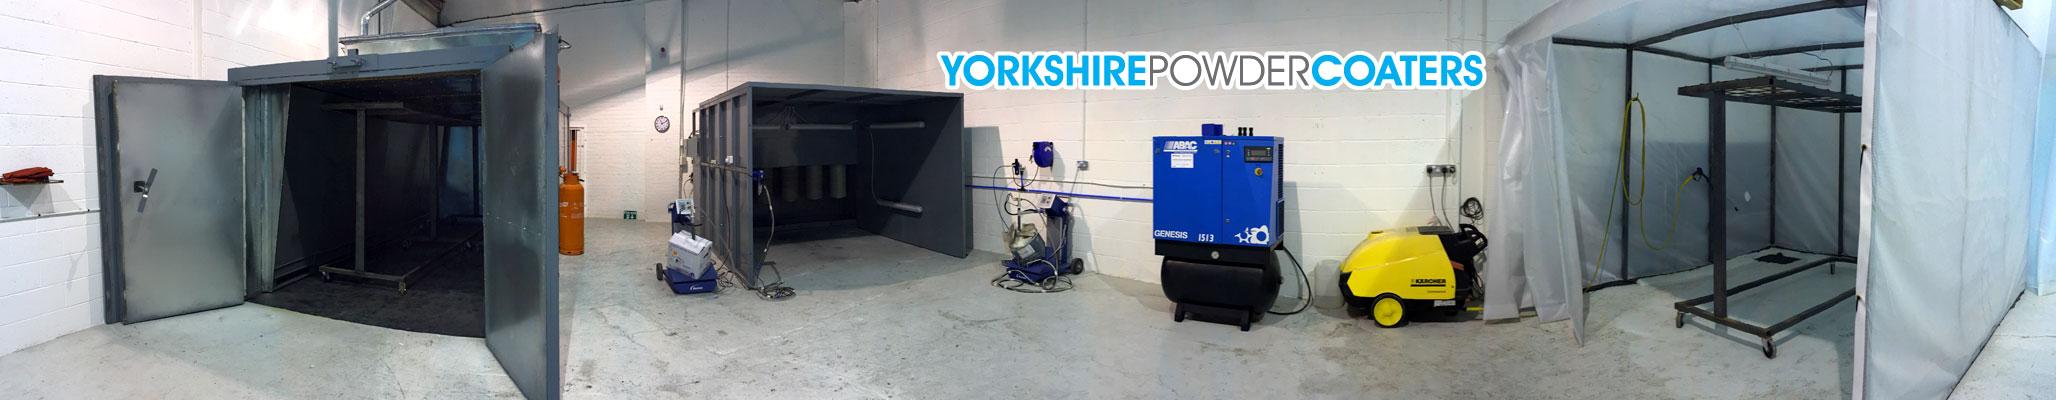 Metal Coating, Powder Coating Services Leeds, Yorkshire